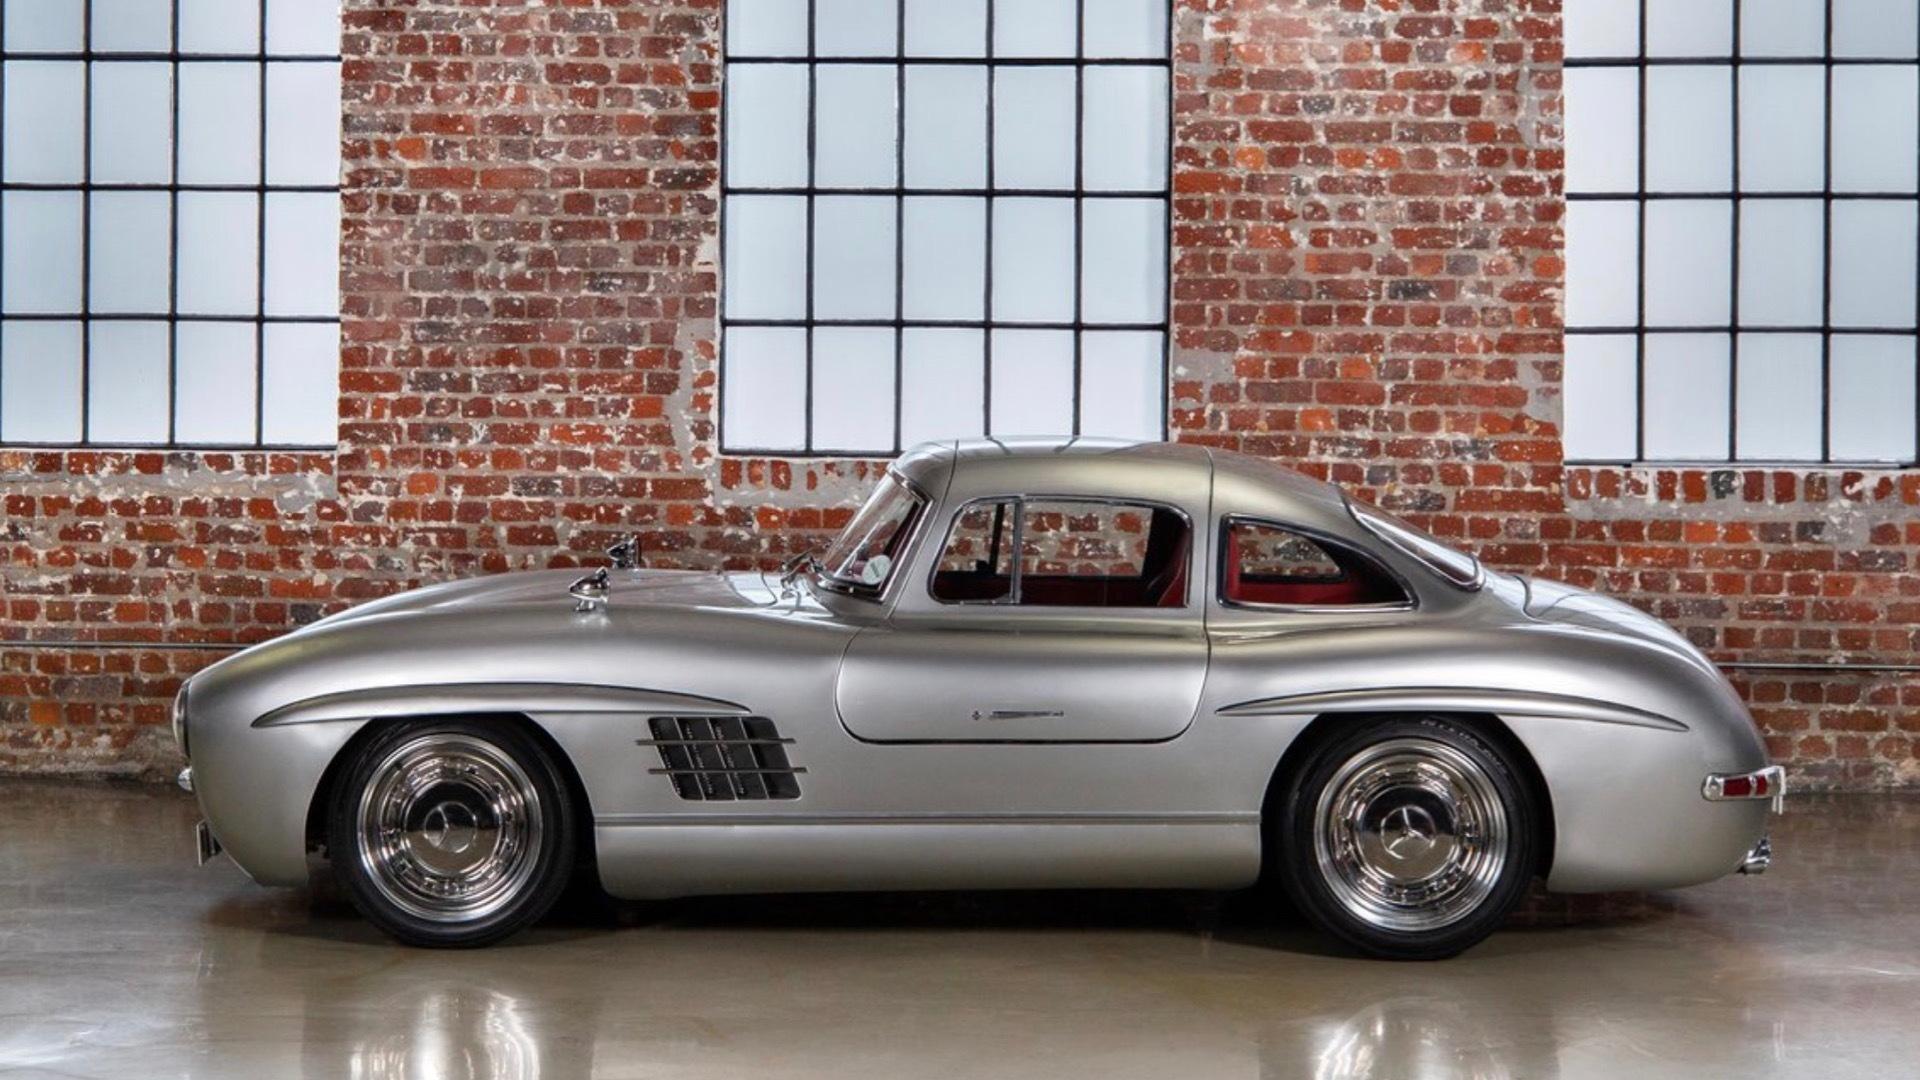 Mercedes-Benz 300SL gullwing replica (Photo by Crossley & Webb)